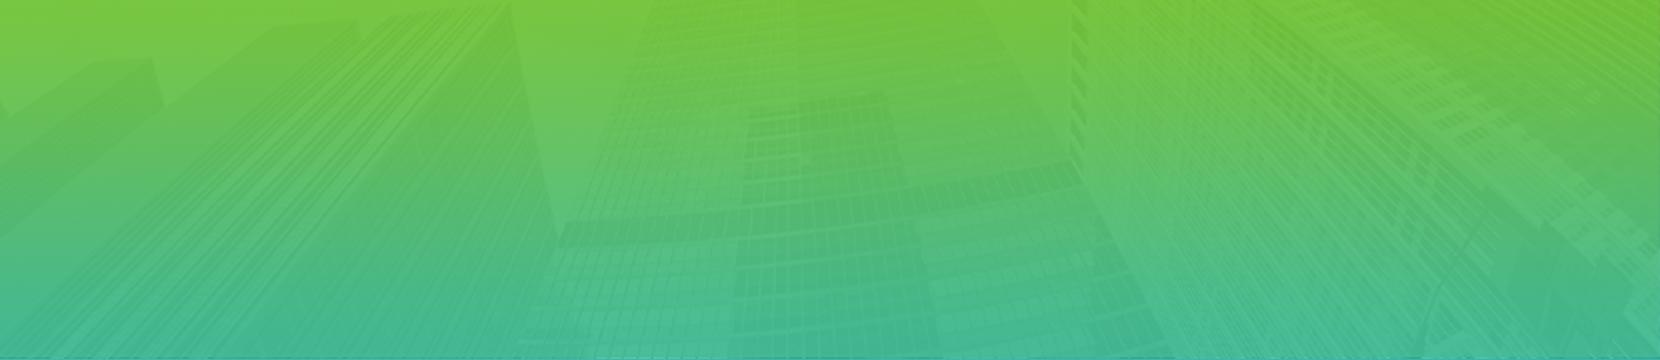 brochure - Landing Page Background_02